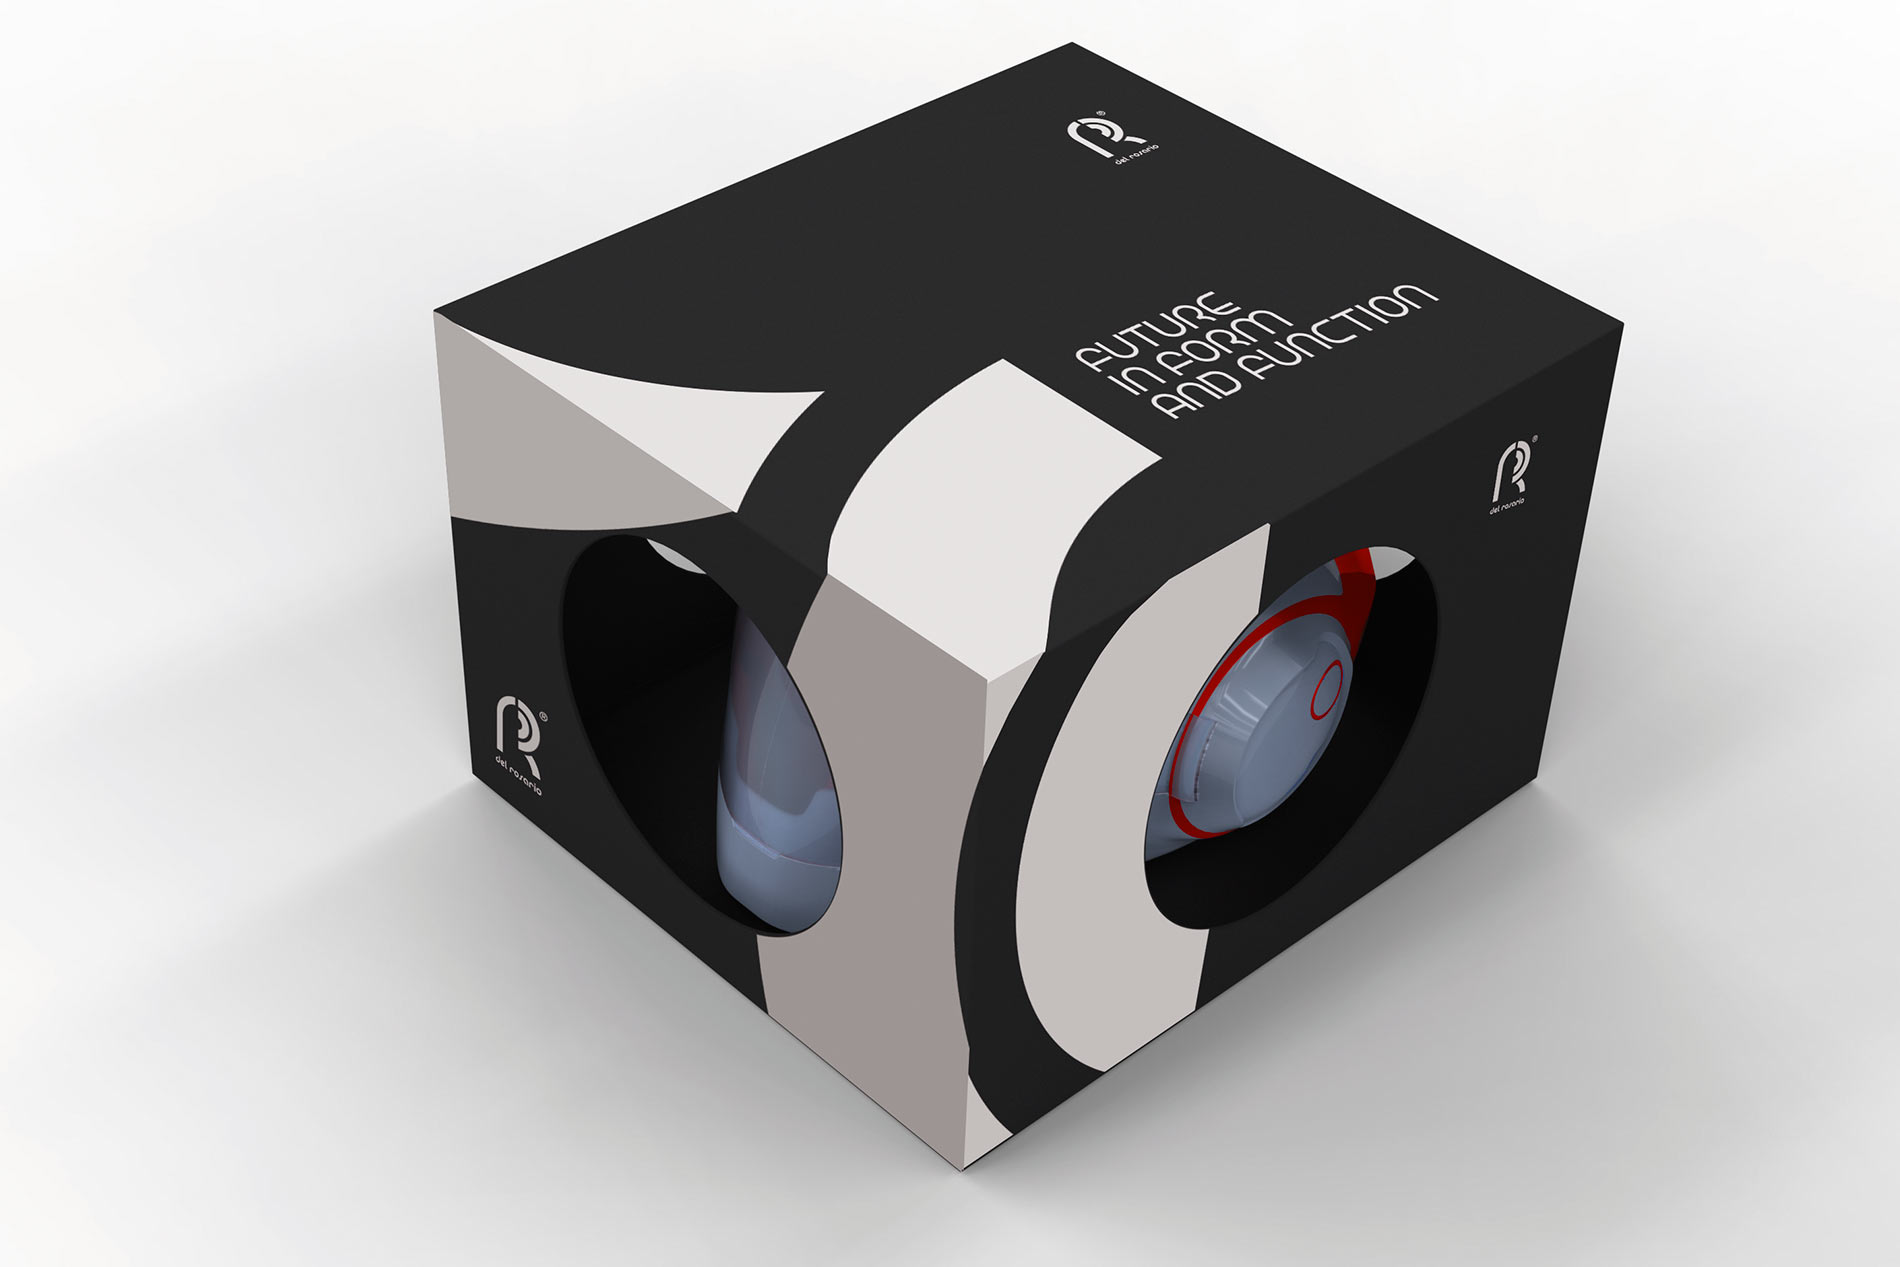 Janina-Lermer-Markenentwickung-Markengestaltung-Branddevelopment-Branddesign-Del-Rosario-Verpackung-Packaging